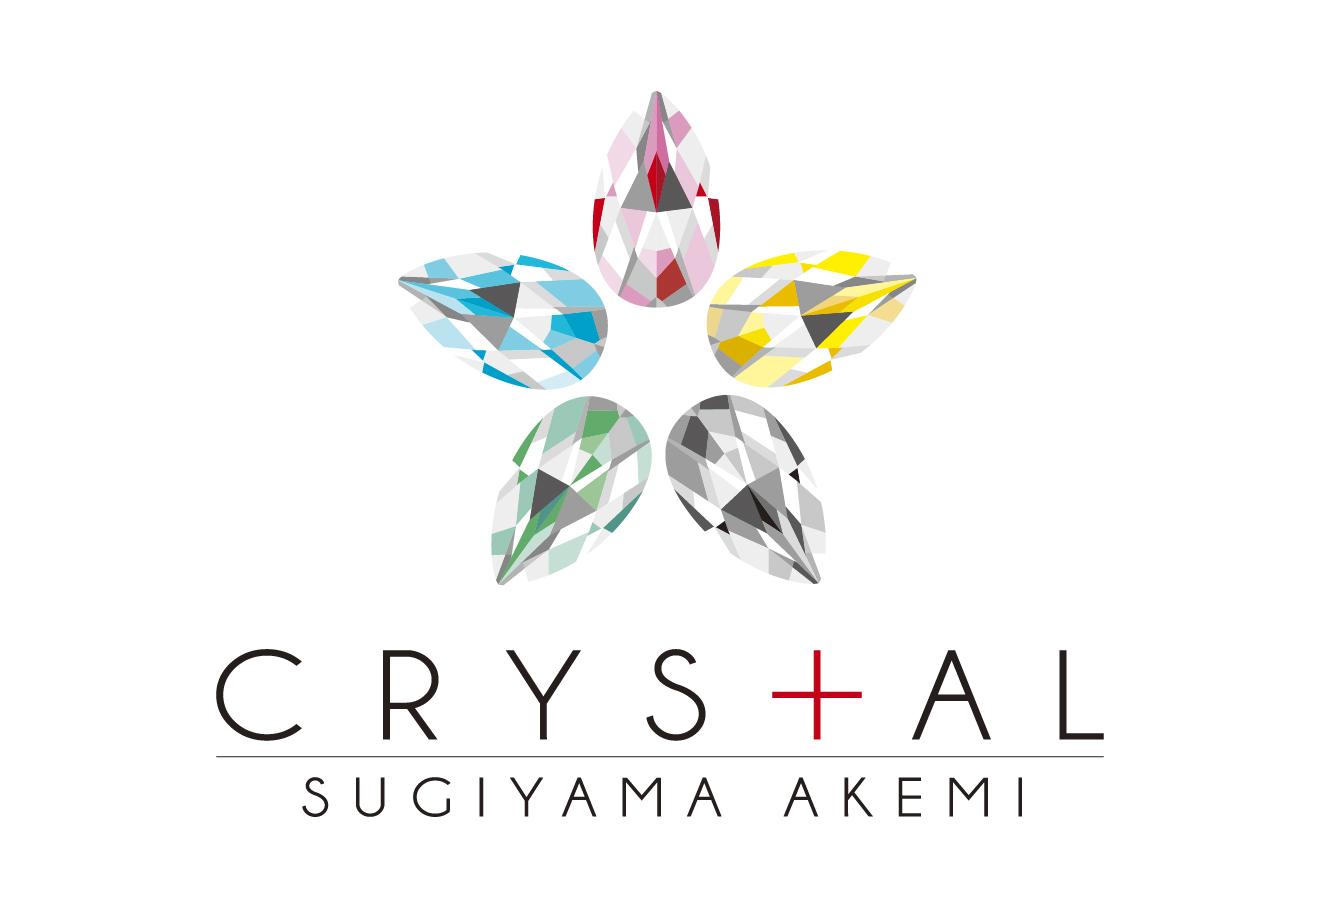 Crystal Sugiyama Akemi